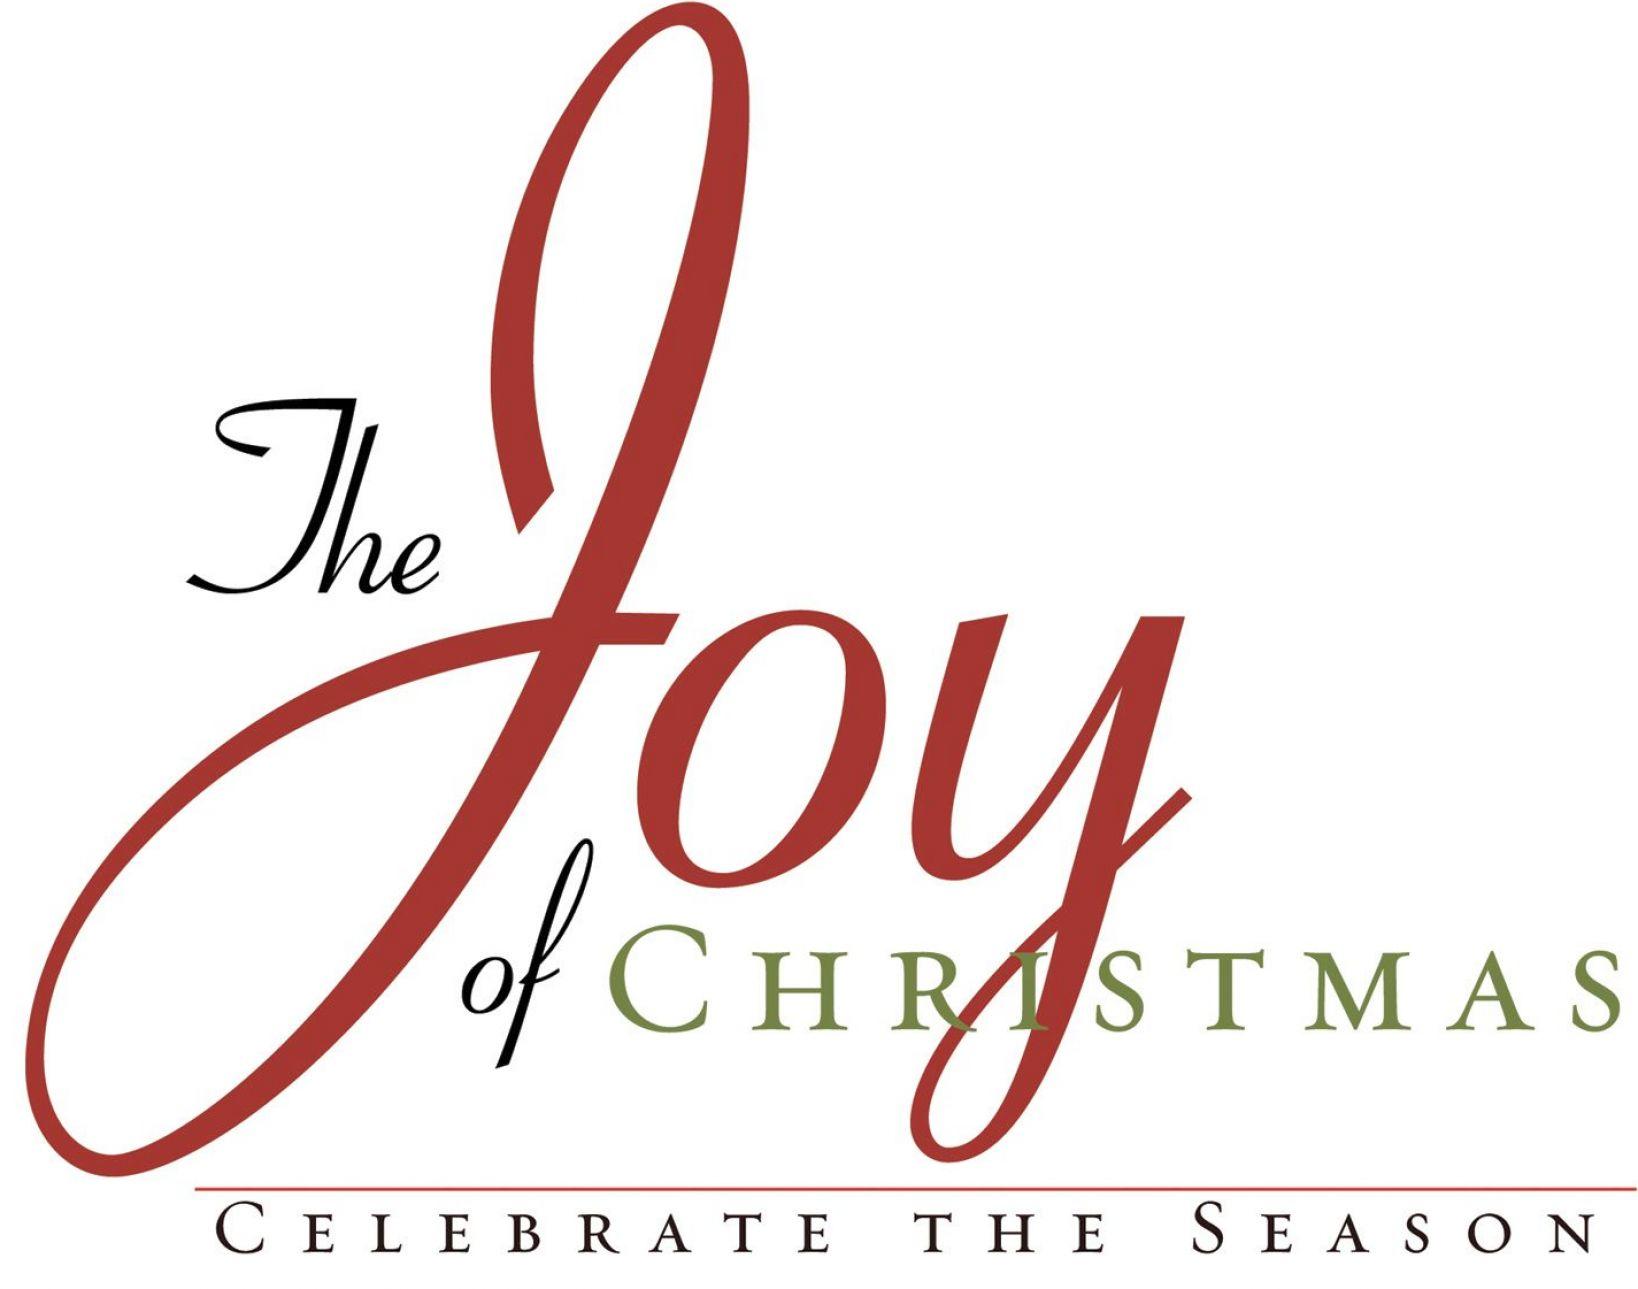 Religious Christmas Clipart 1joy Of Christmas